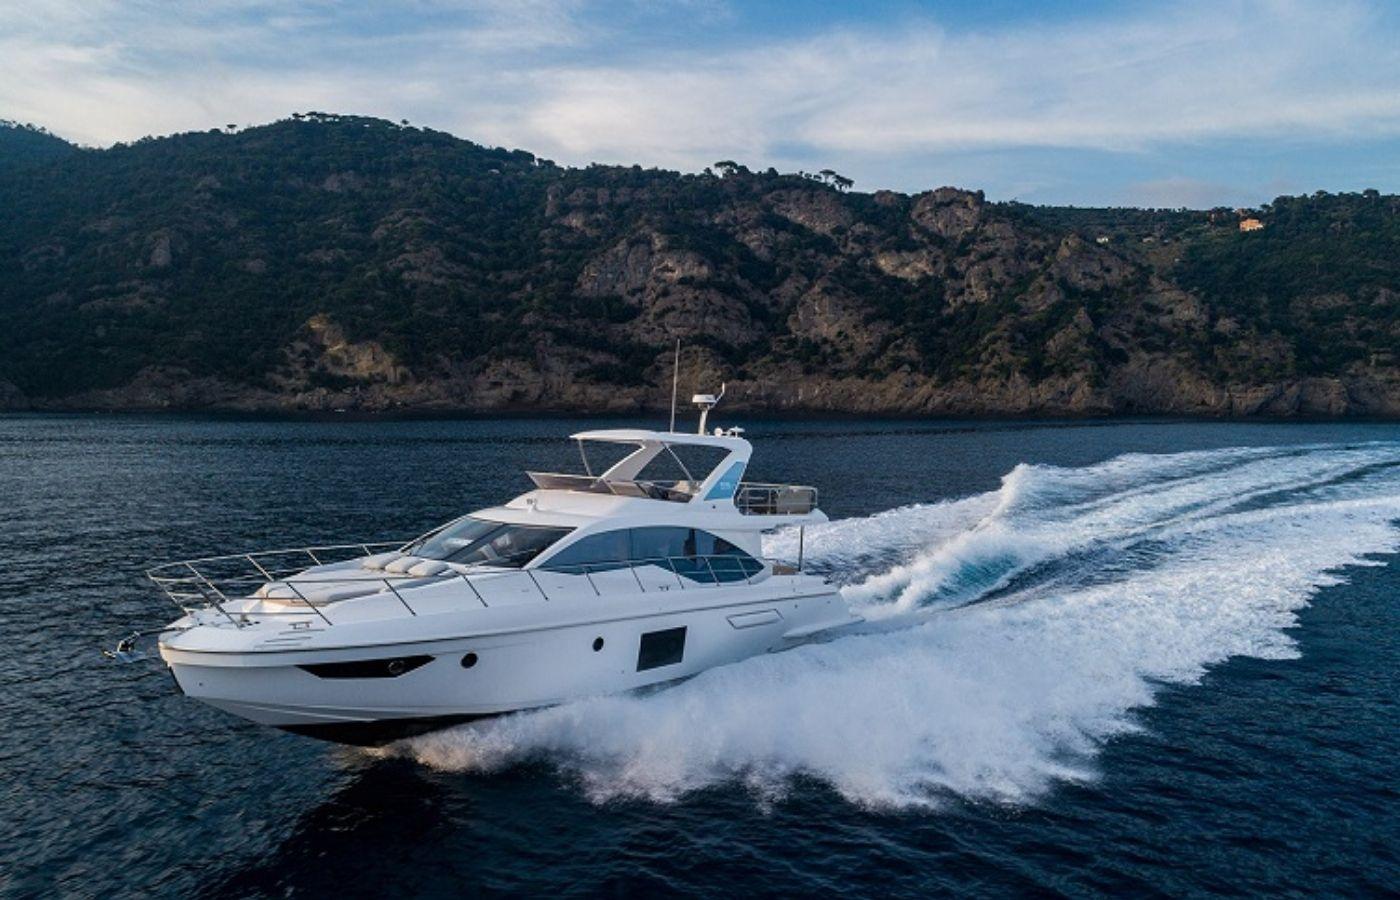 55 Azimut Fly Motor Yacht Sold By Jordan Preusz